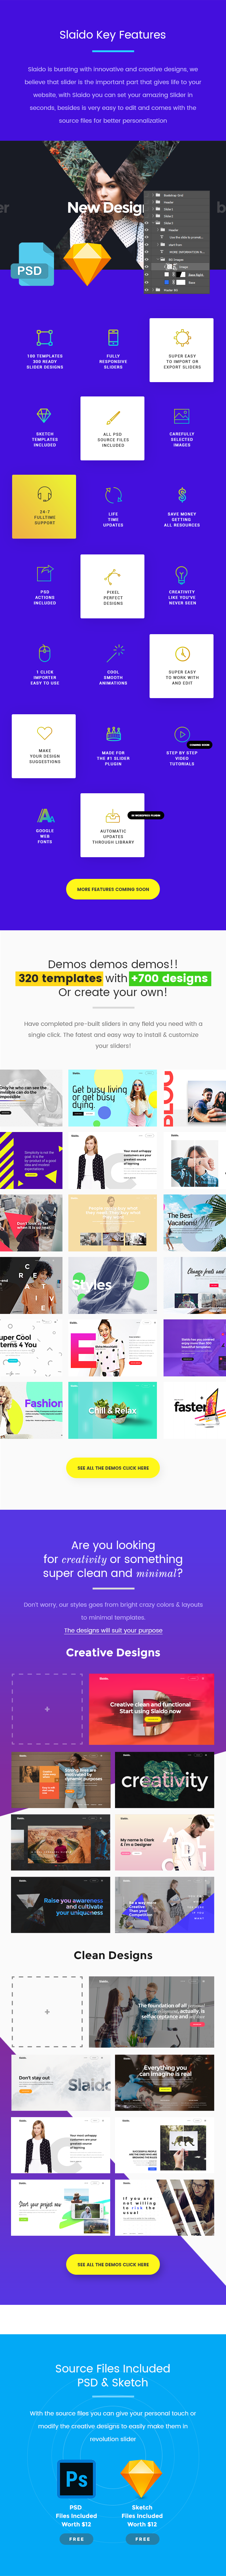 Slaido - Template Pack for Slider Revolution WordPress Plugin - 5